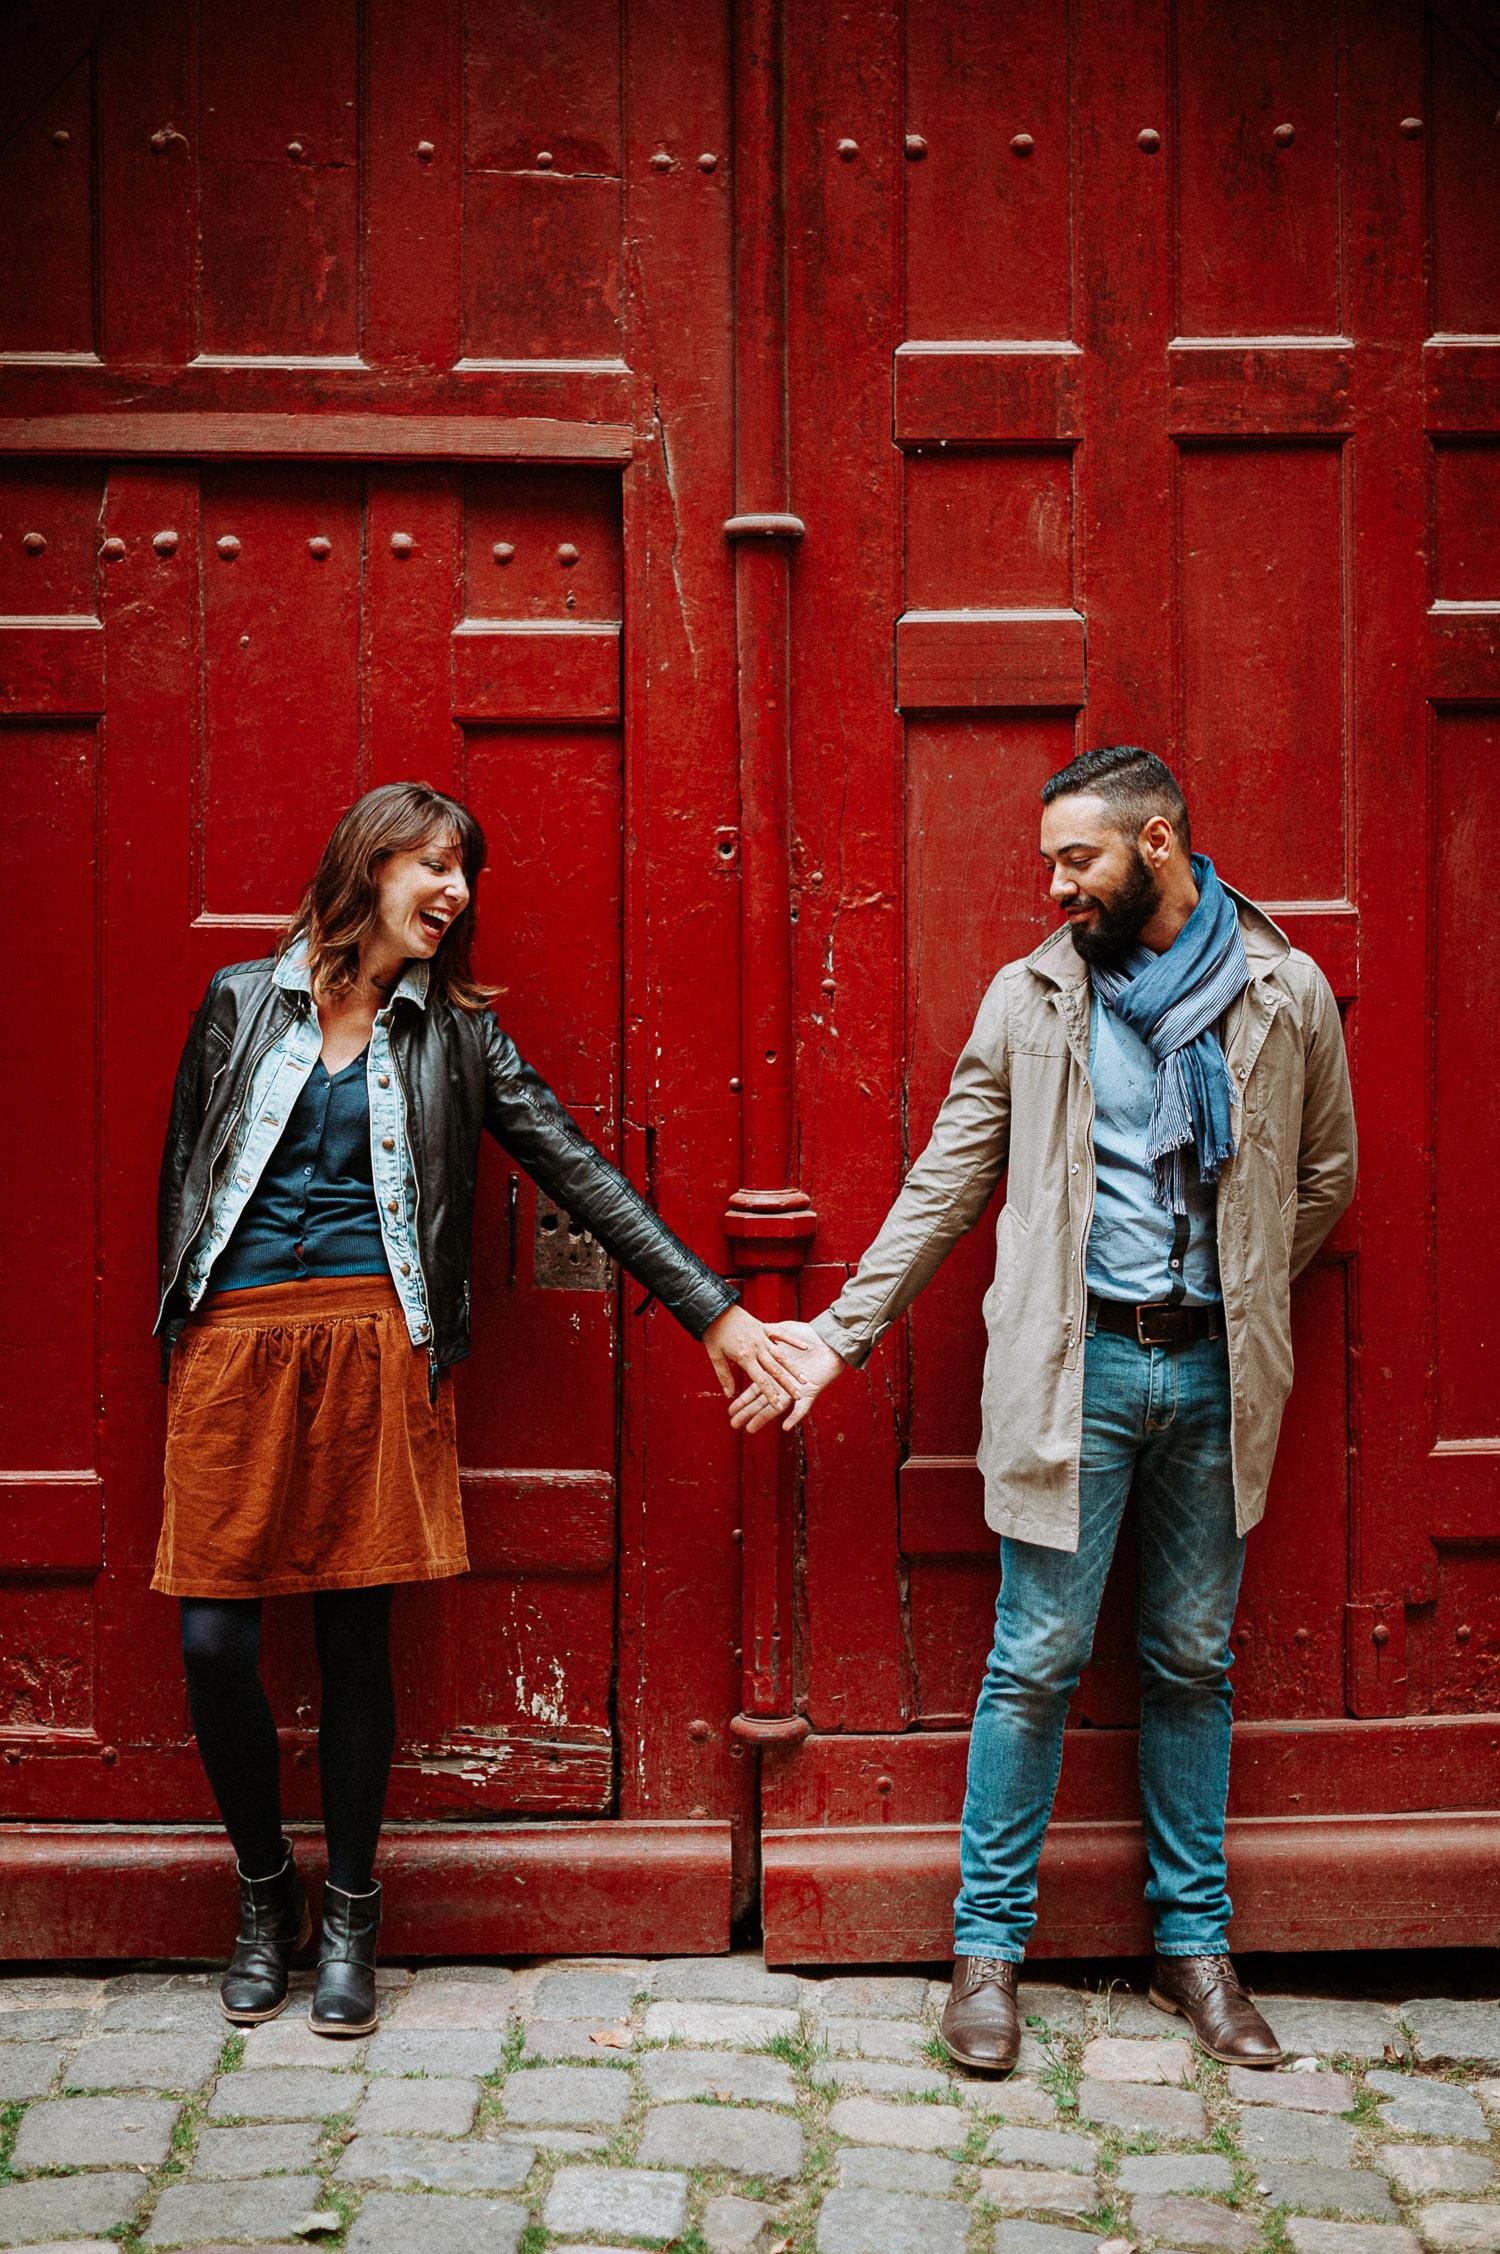 julien-saura-rennes-photographe-seance-couple-02